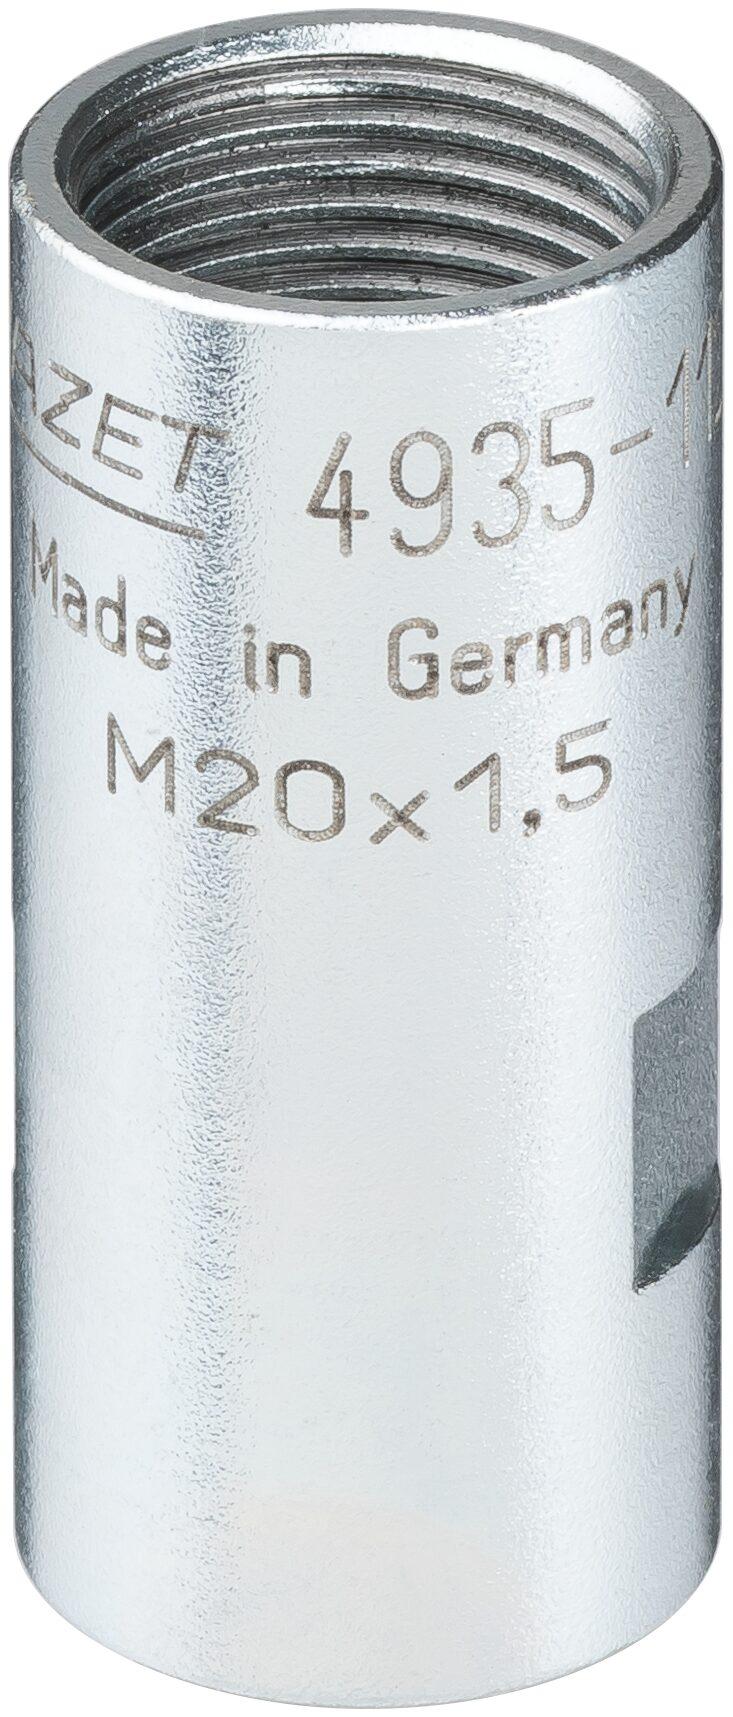 HAZET Ausziehhülse M20x1,5 4935-1120